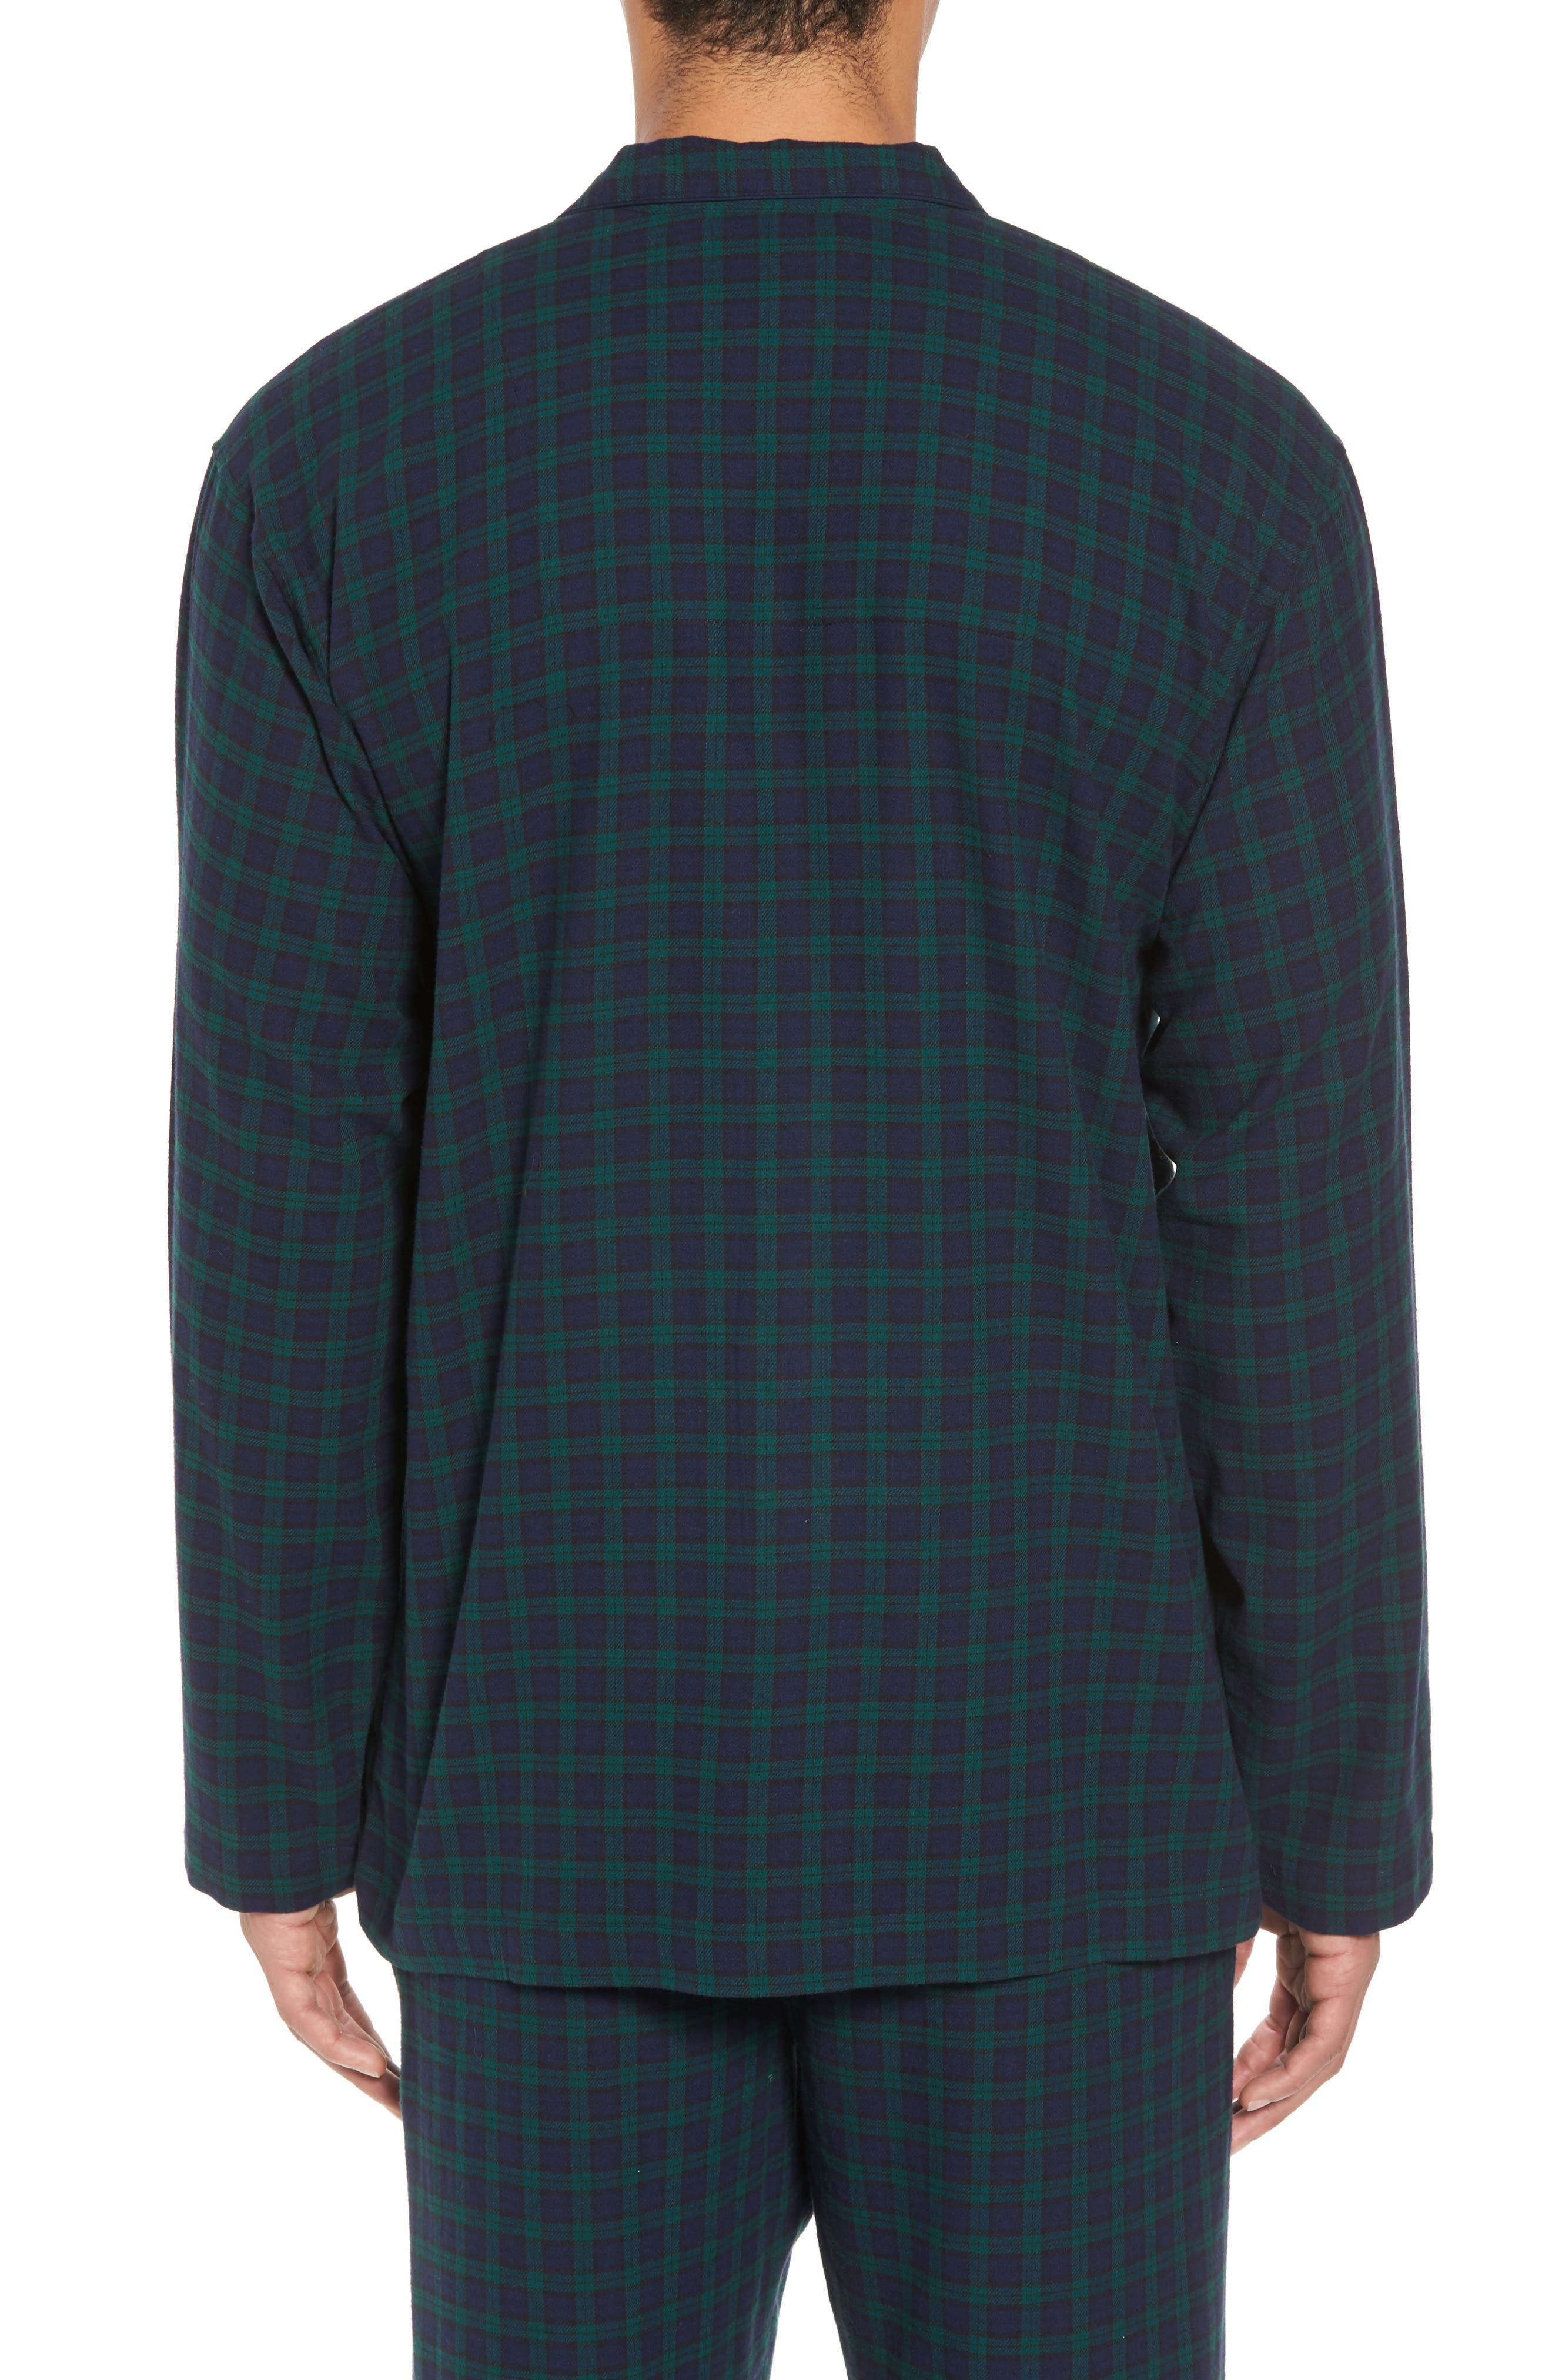 Polo Ralph Lauren Flannel Pajama Shirt,                             Alternate thumbnail 7, color,